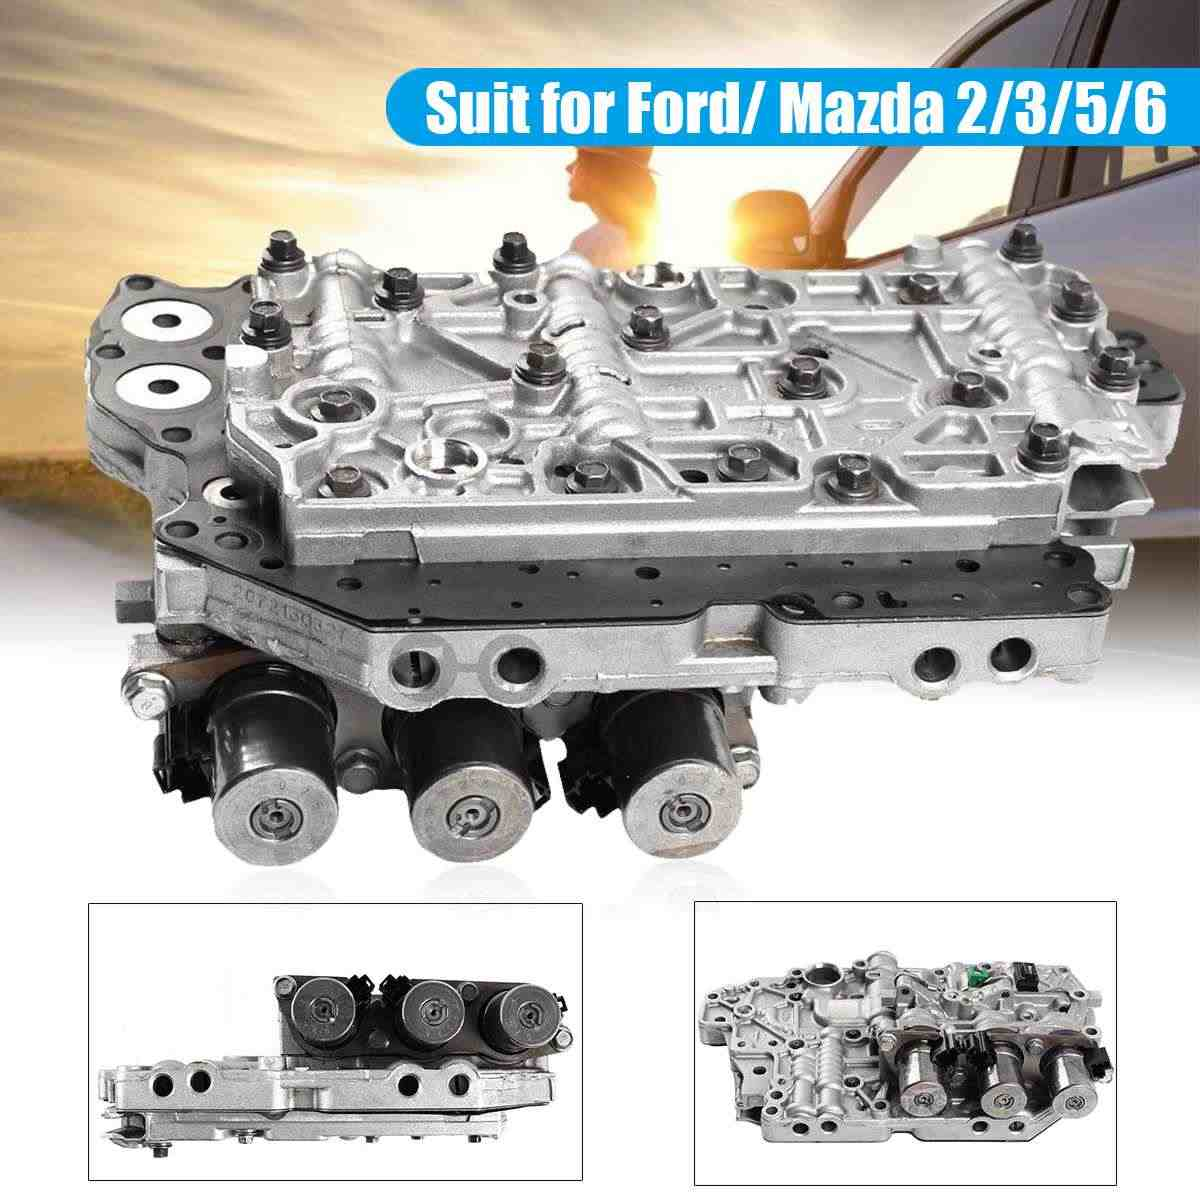 TF80SC AF21B AW6A EL Transmission valve body with all